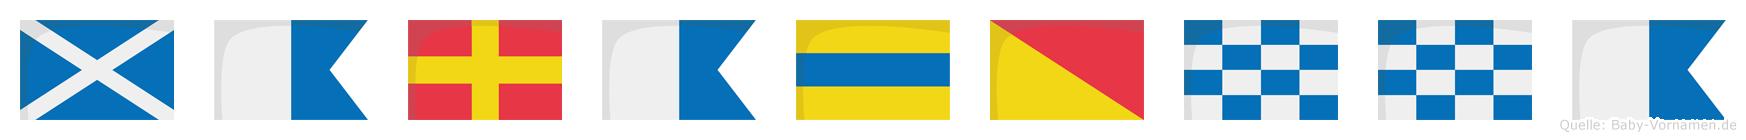 Maradonna im Flaggenalphabet